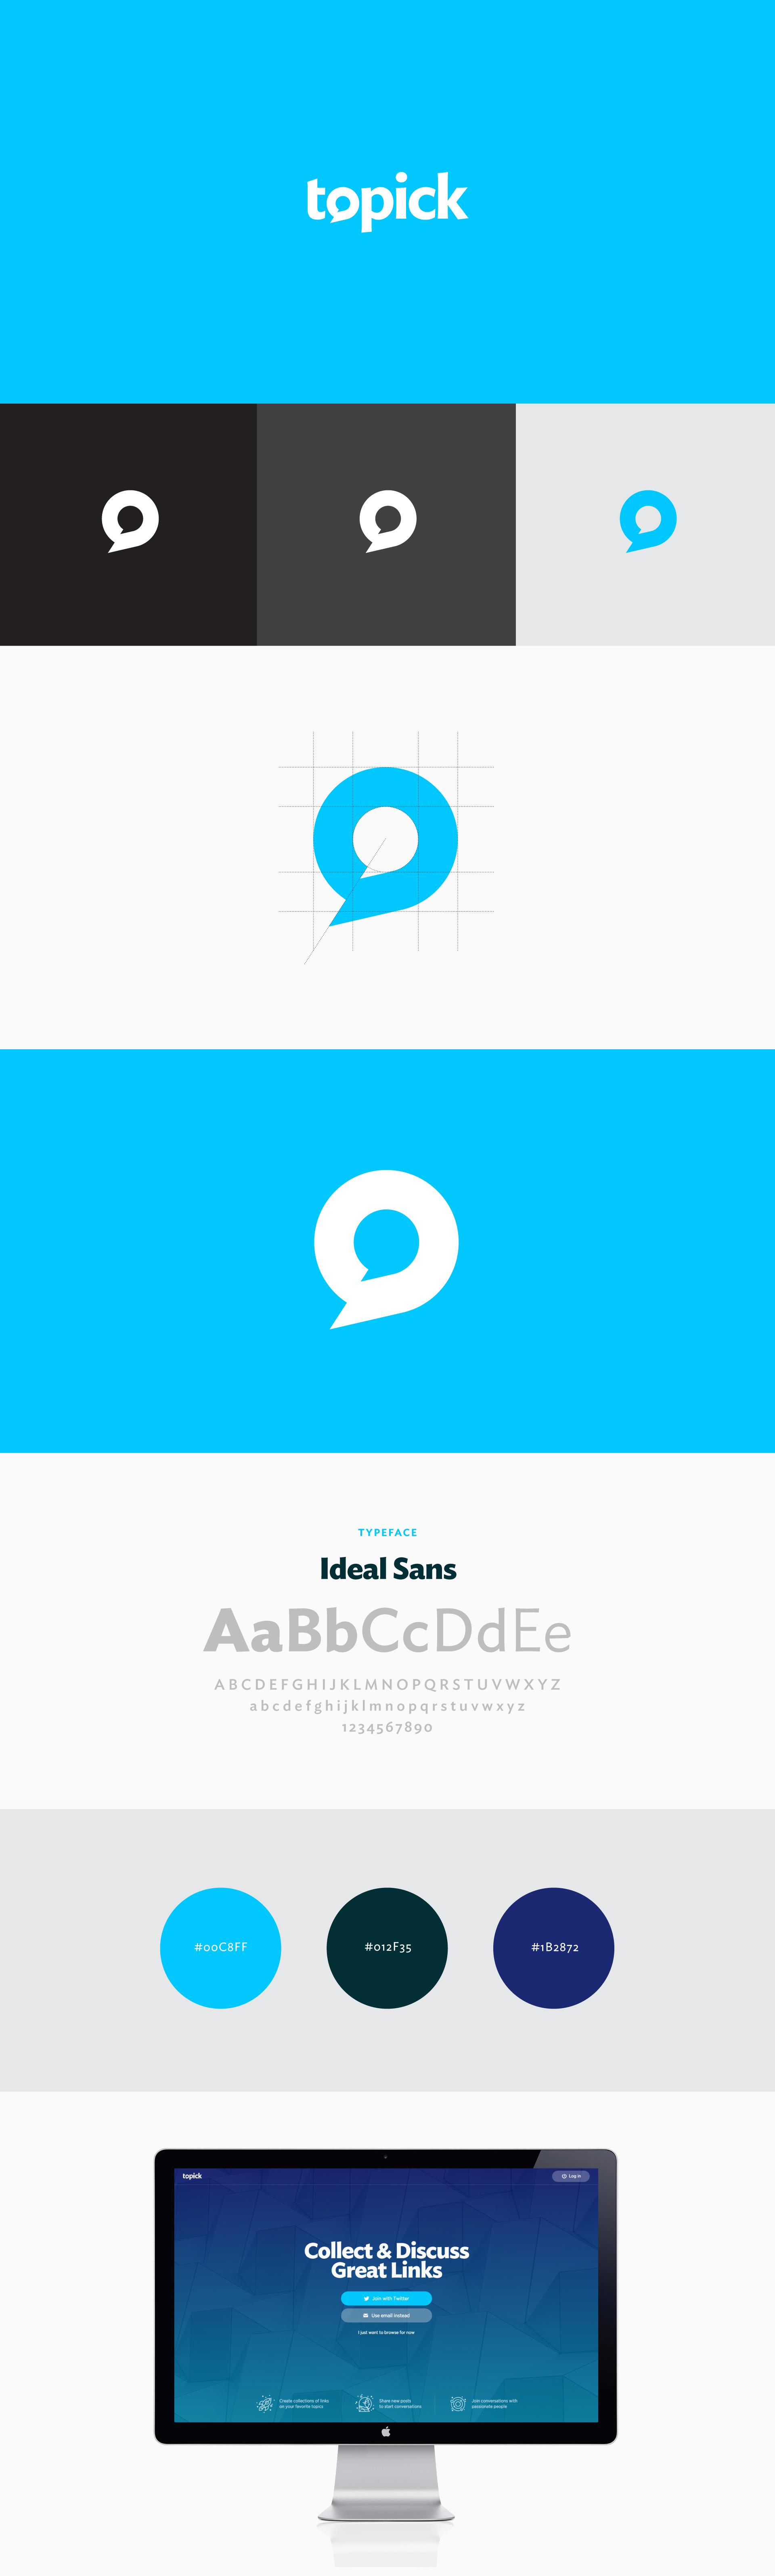 Raewyn Brandon Graphic Design Tauranga - Topick Brand Logo Design